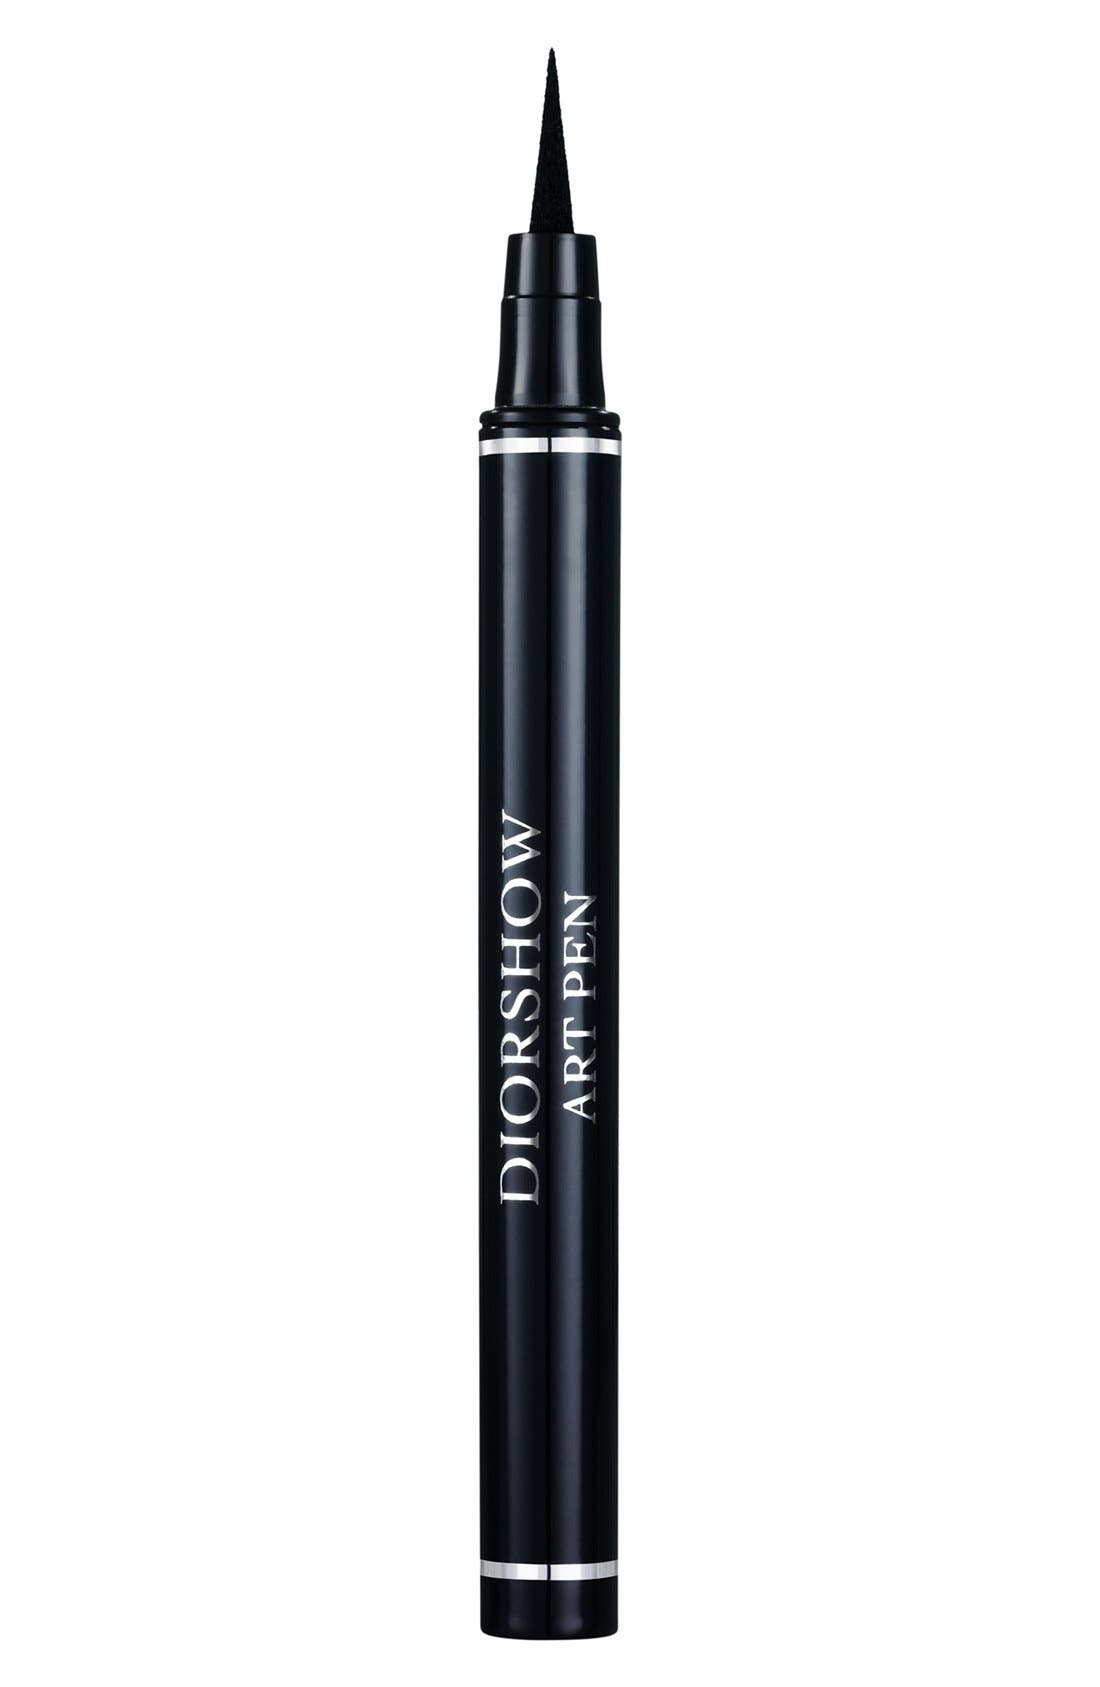 Dior 'Diorshow Art Pen' Eyeliner